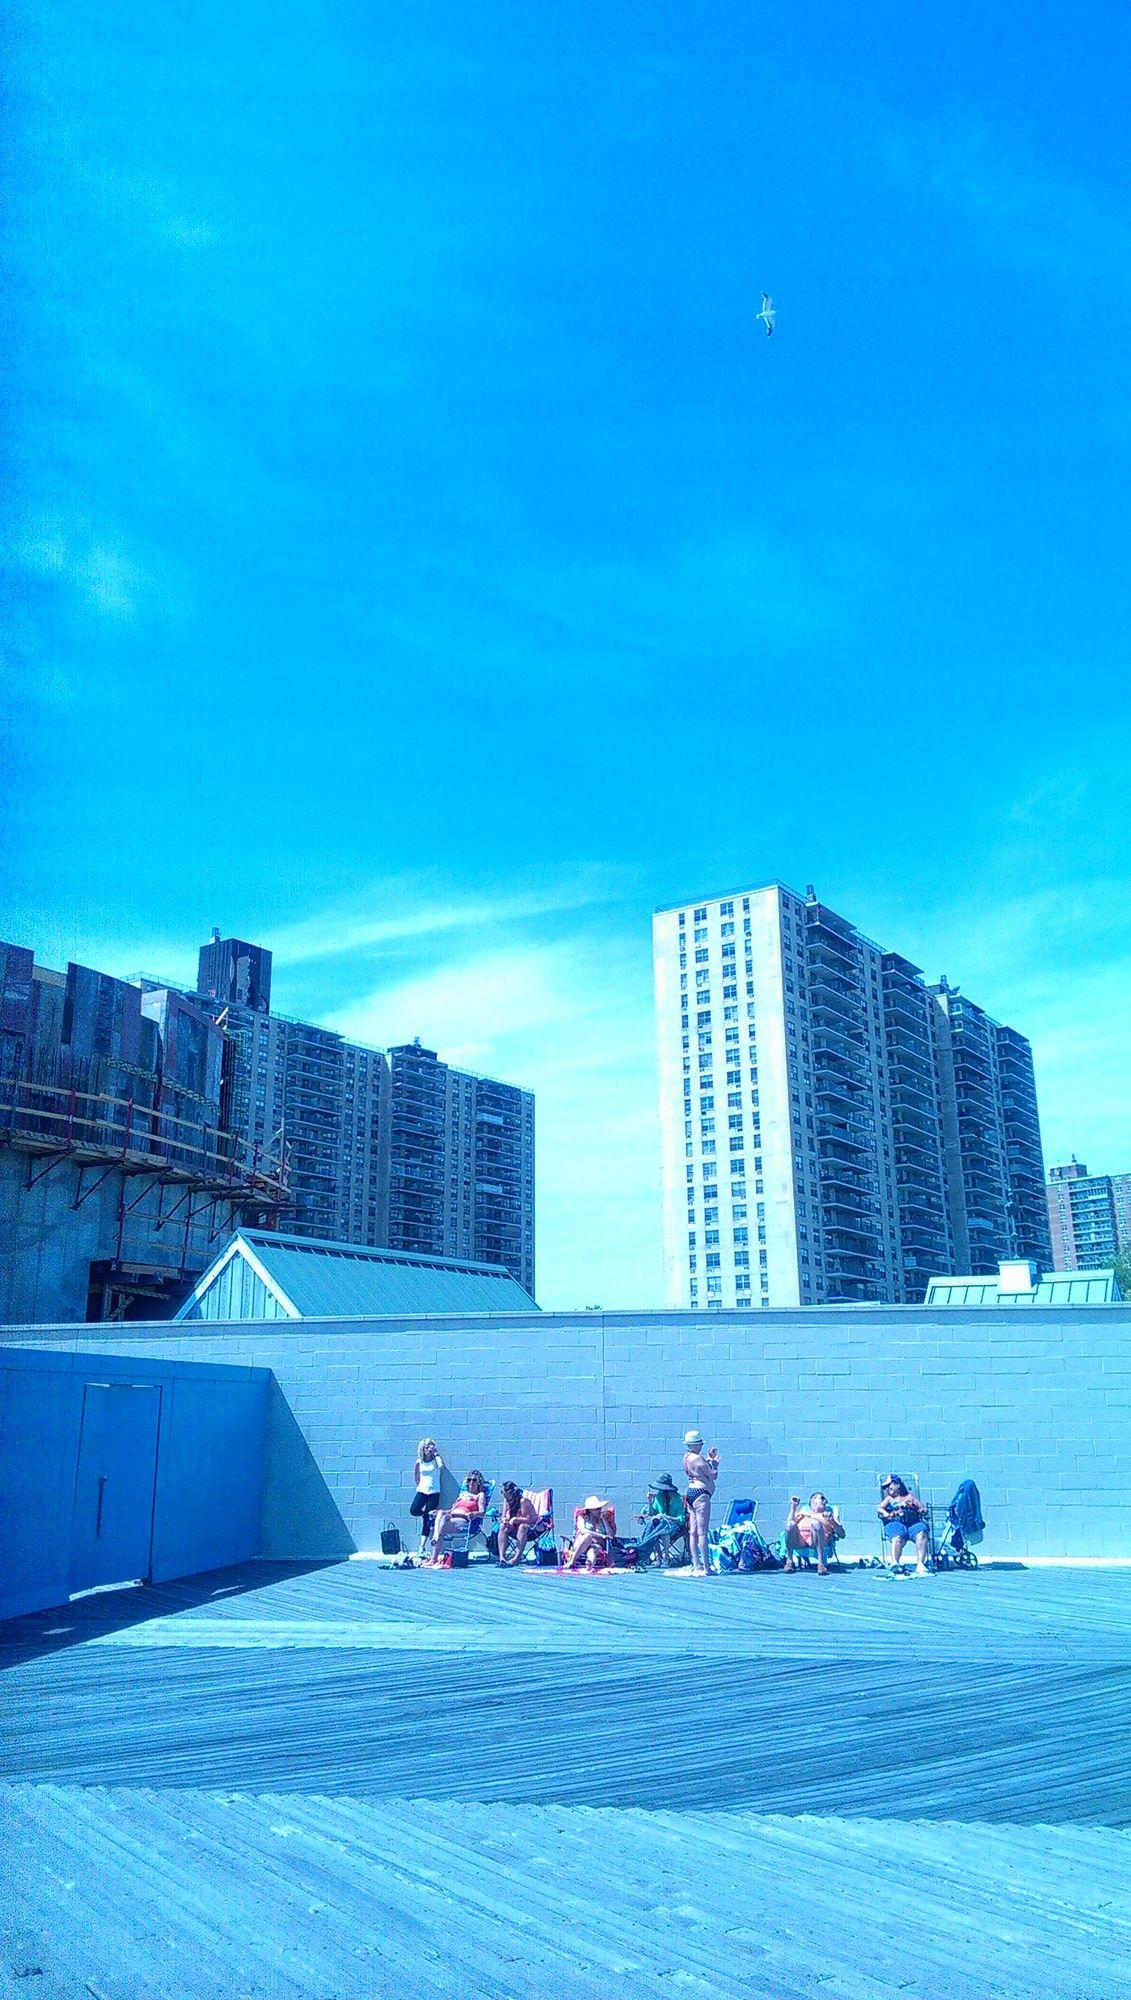 GOSEE : NEW YOR CITY